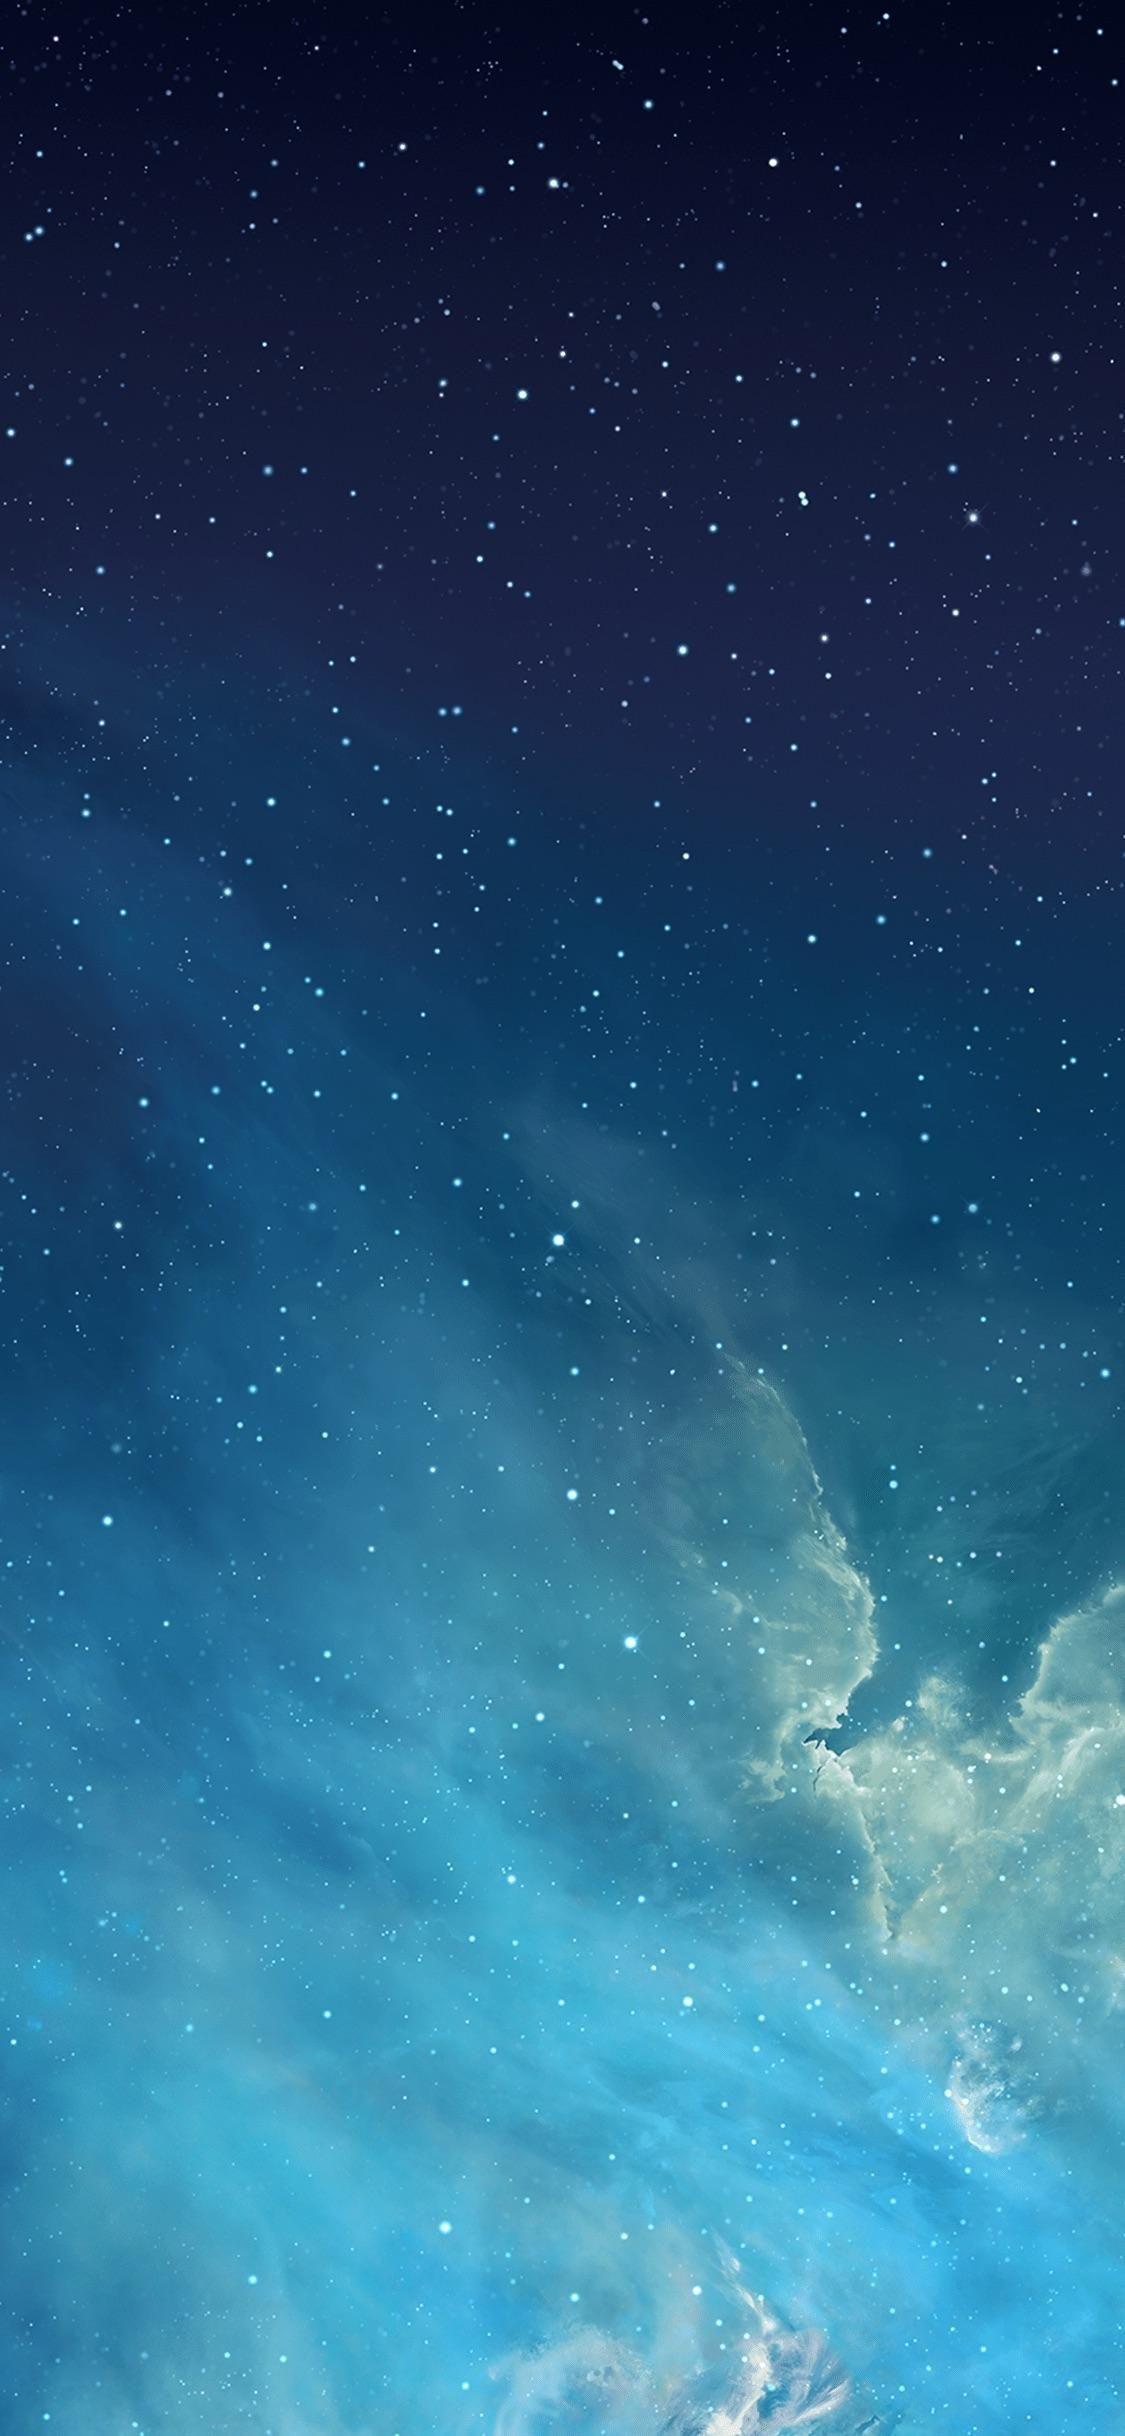 Download New iOS Phone Wallpaper HD 2020 by wallpapers.riy9.com